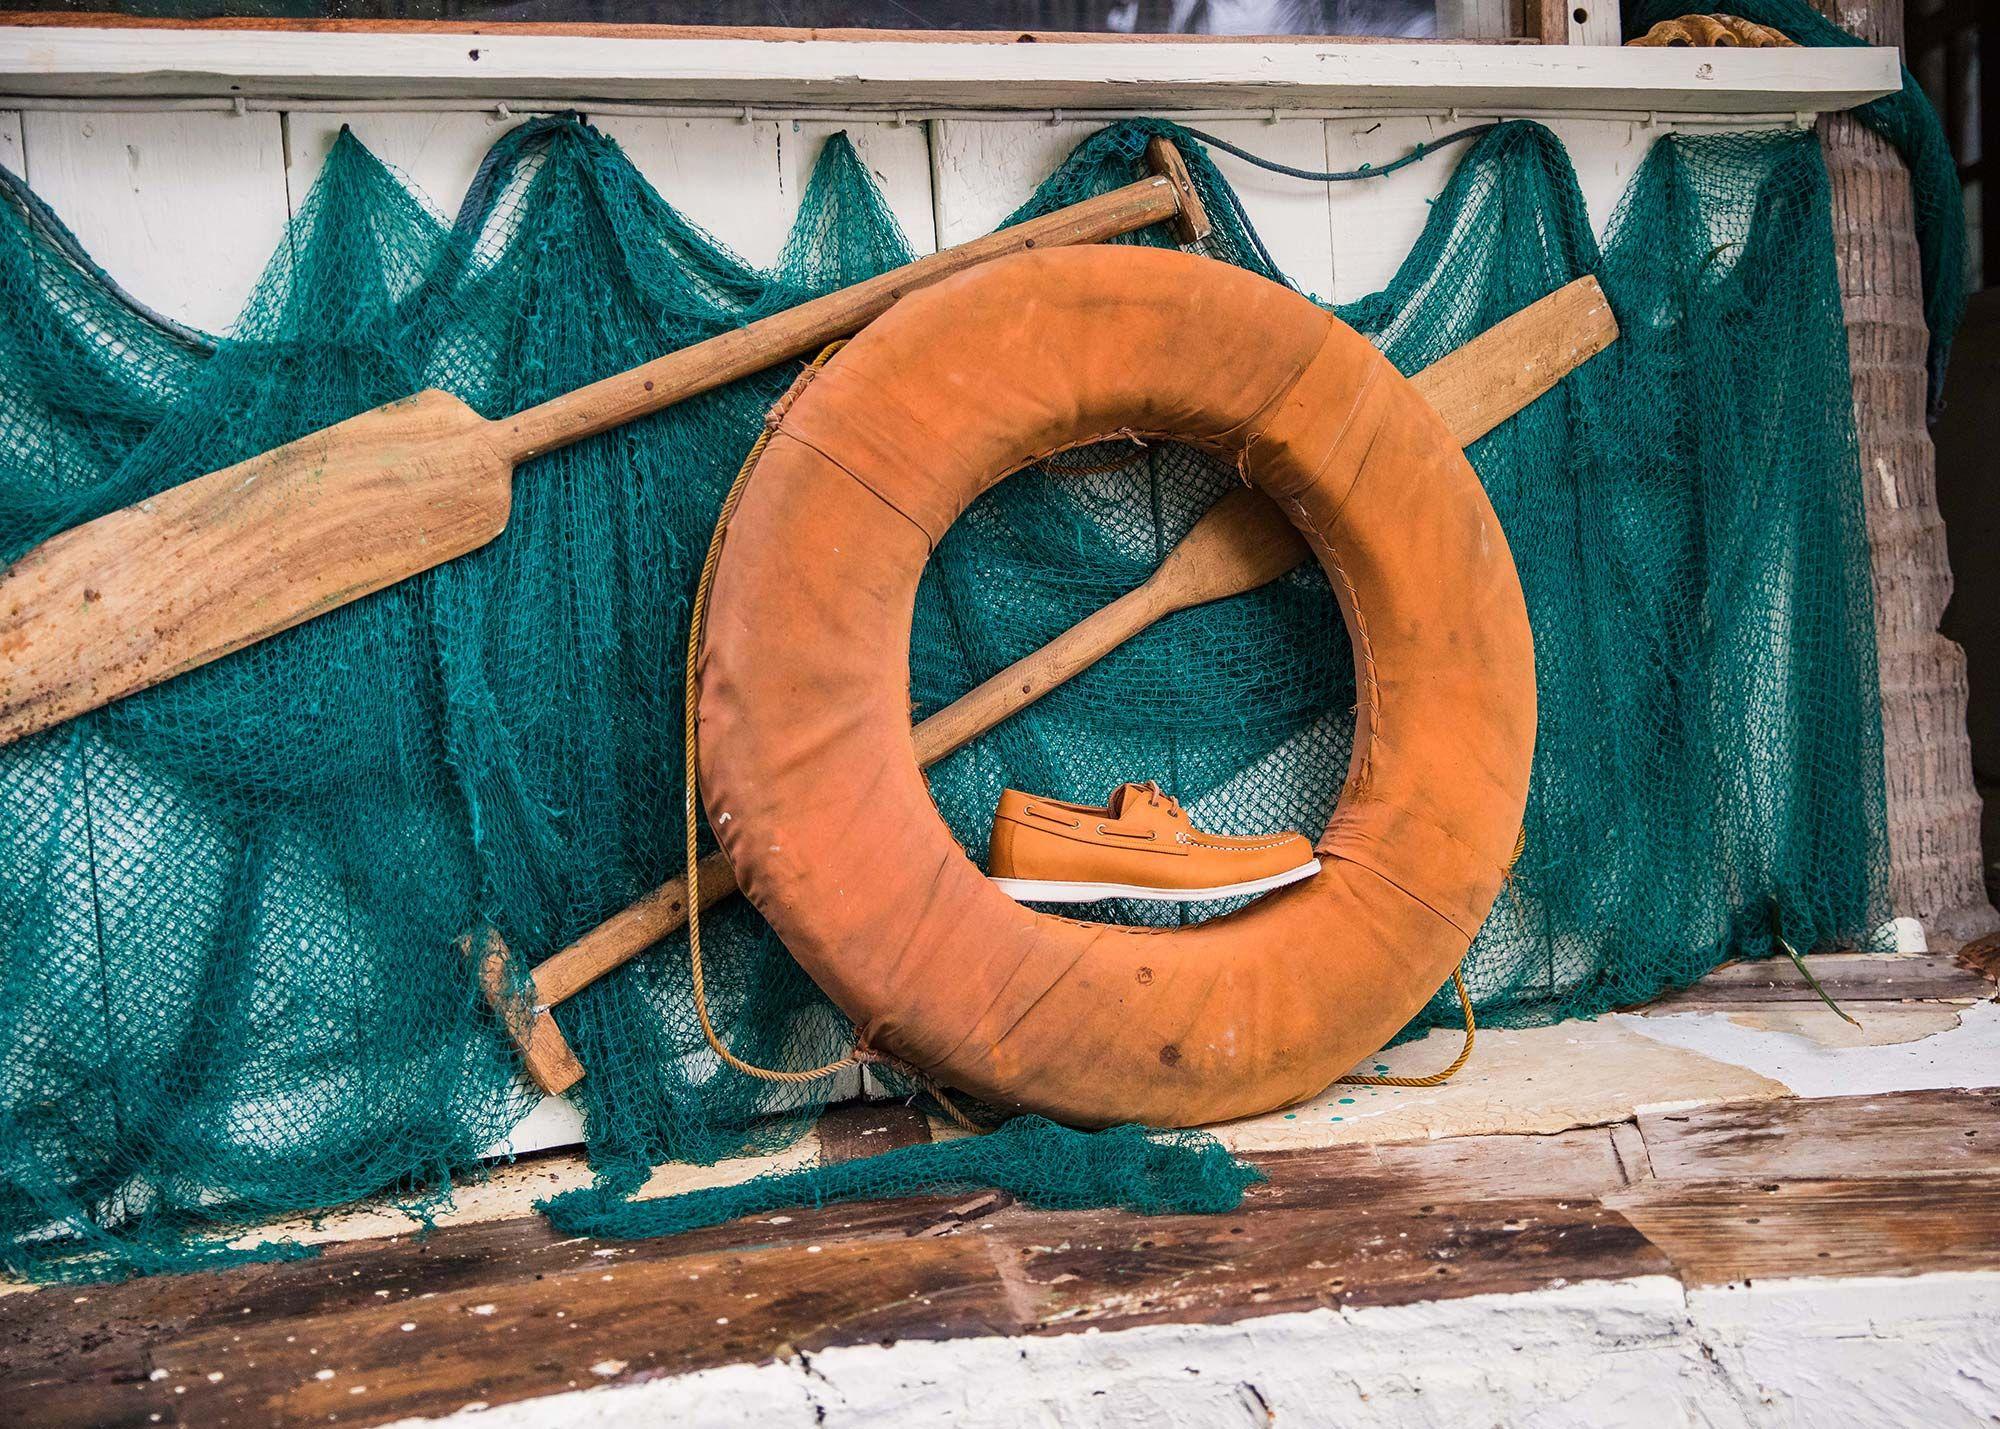 Bared_Footwear_La_Brisa_Bali_Travel_Summer_Mens_Campaign_Helium_Tan_Nubuck_Boat_Shoes